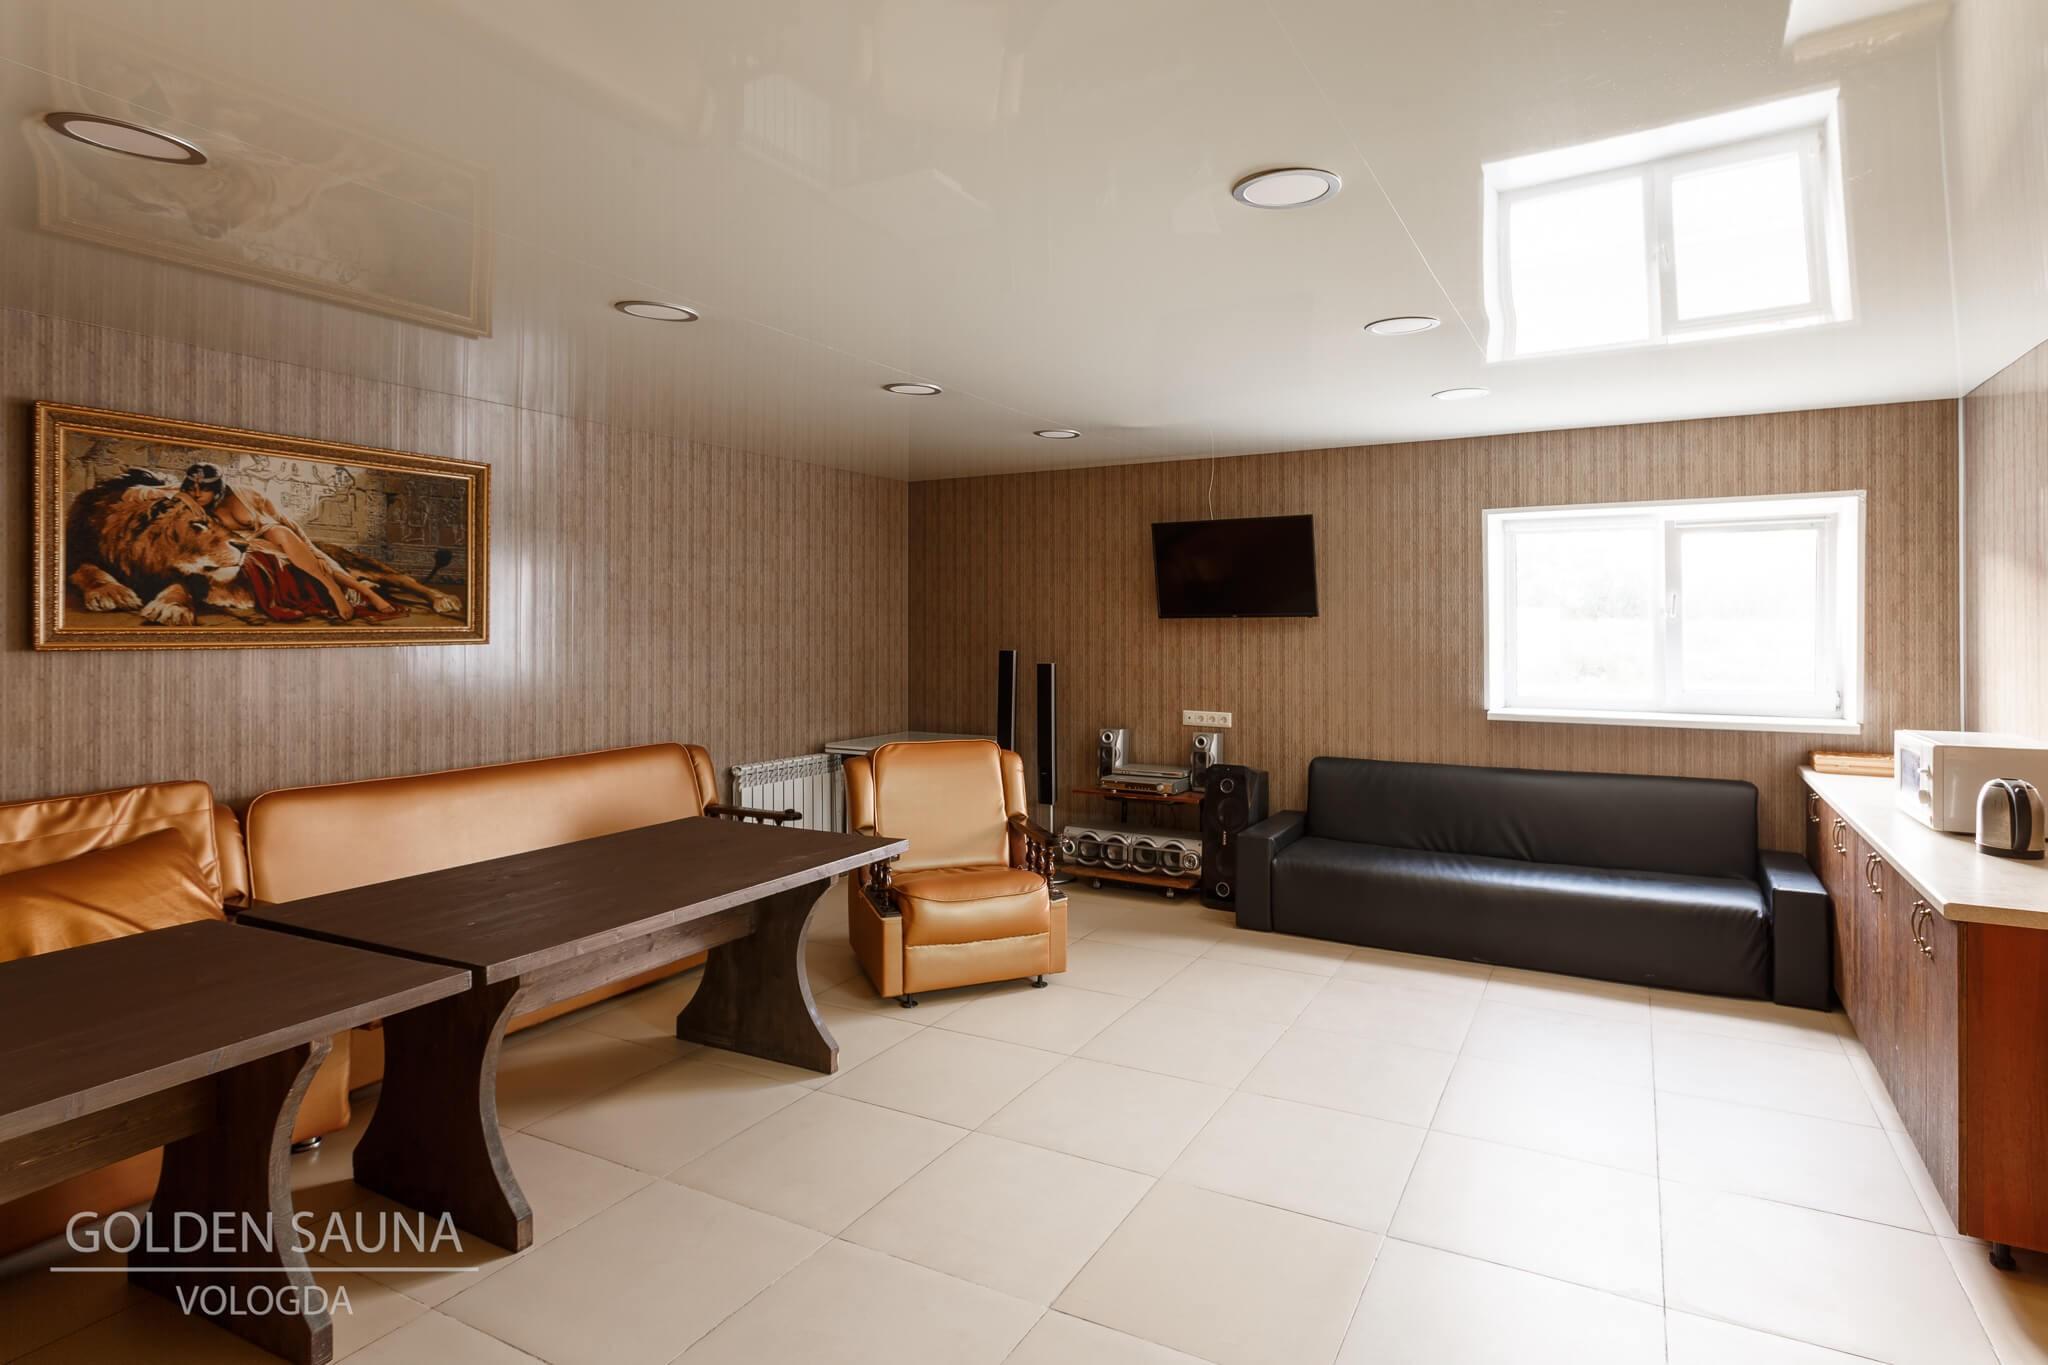 """Golden Sauna"" - №9"